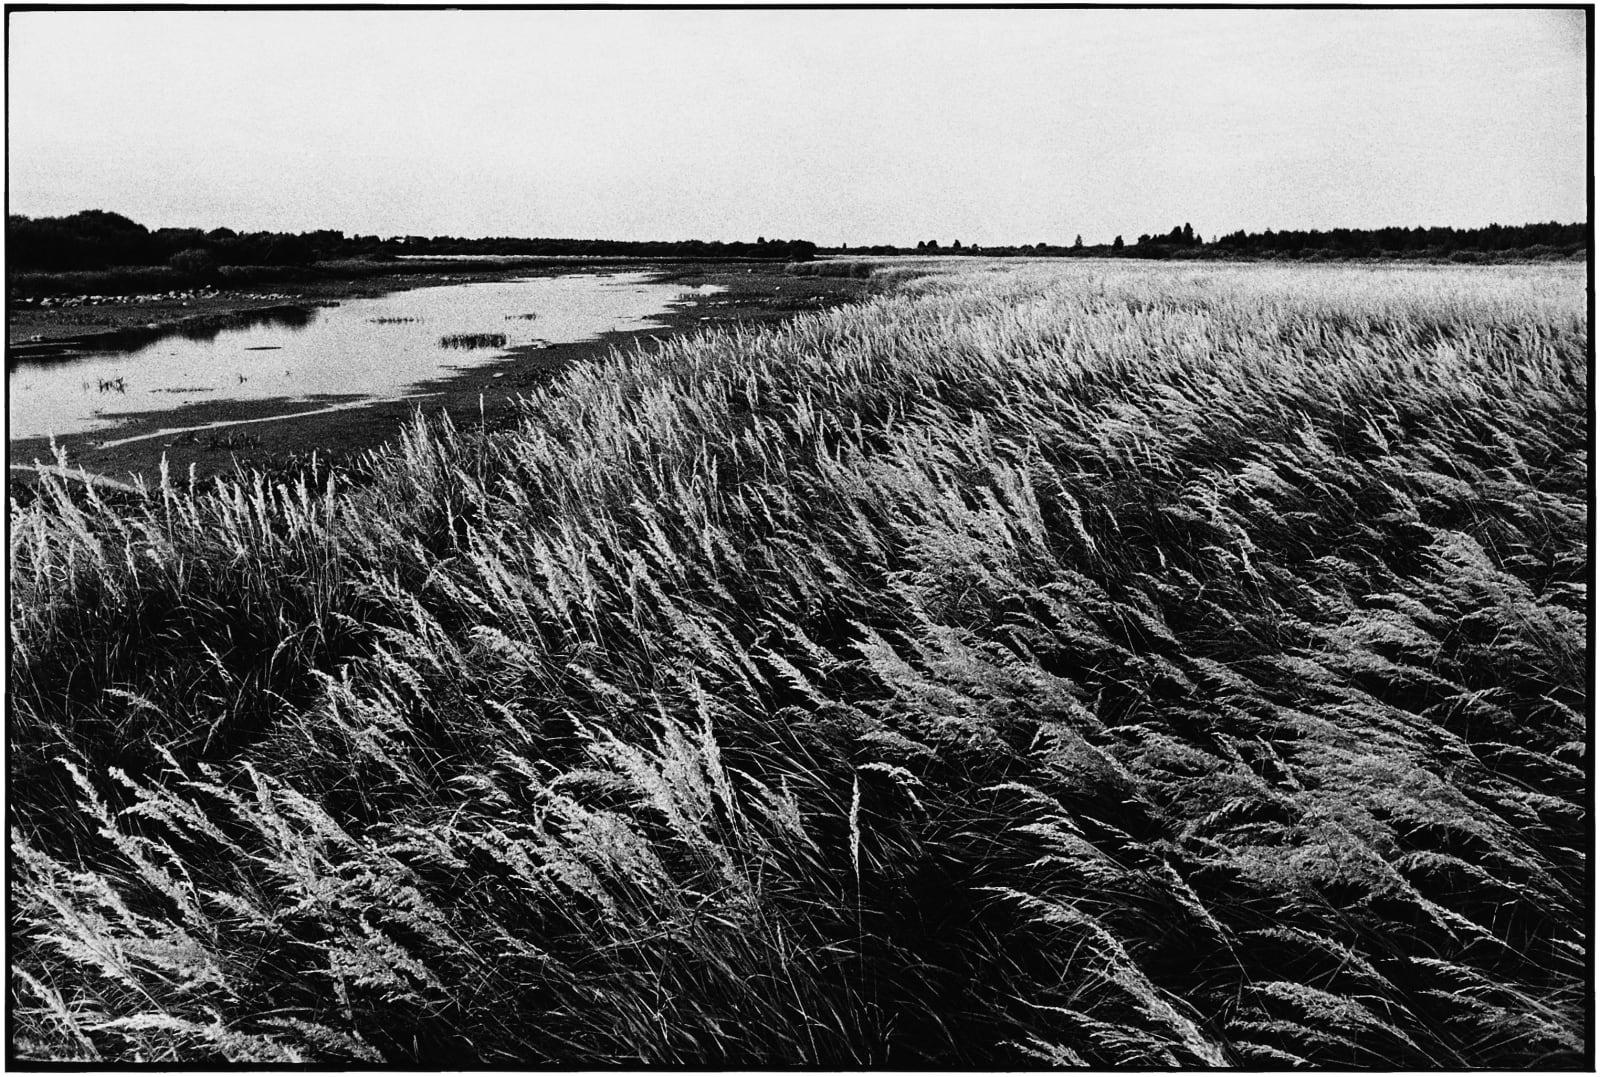 Janez Bogataj, Pastorala I/29, 1980